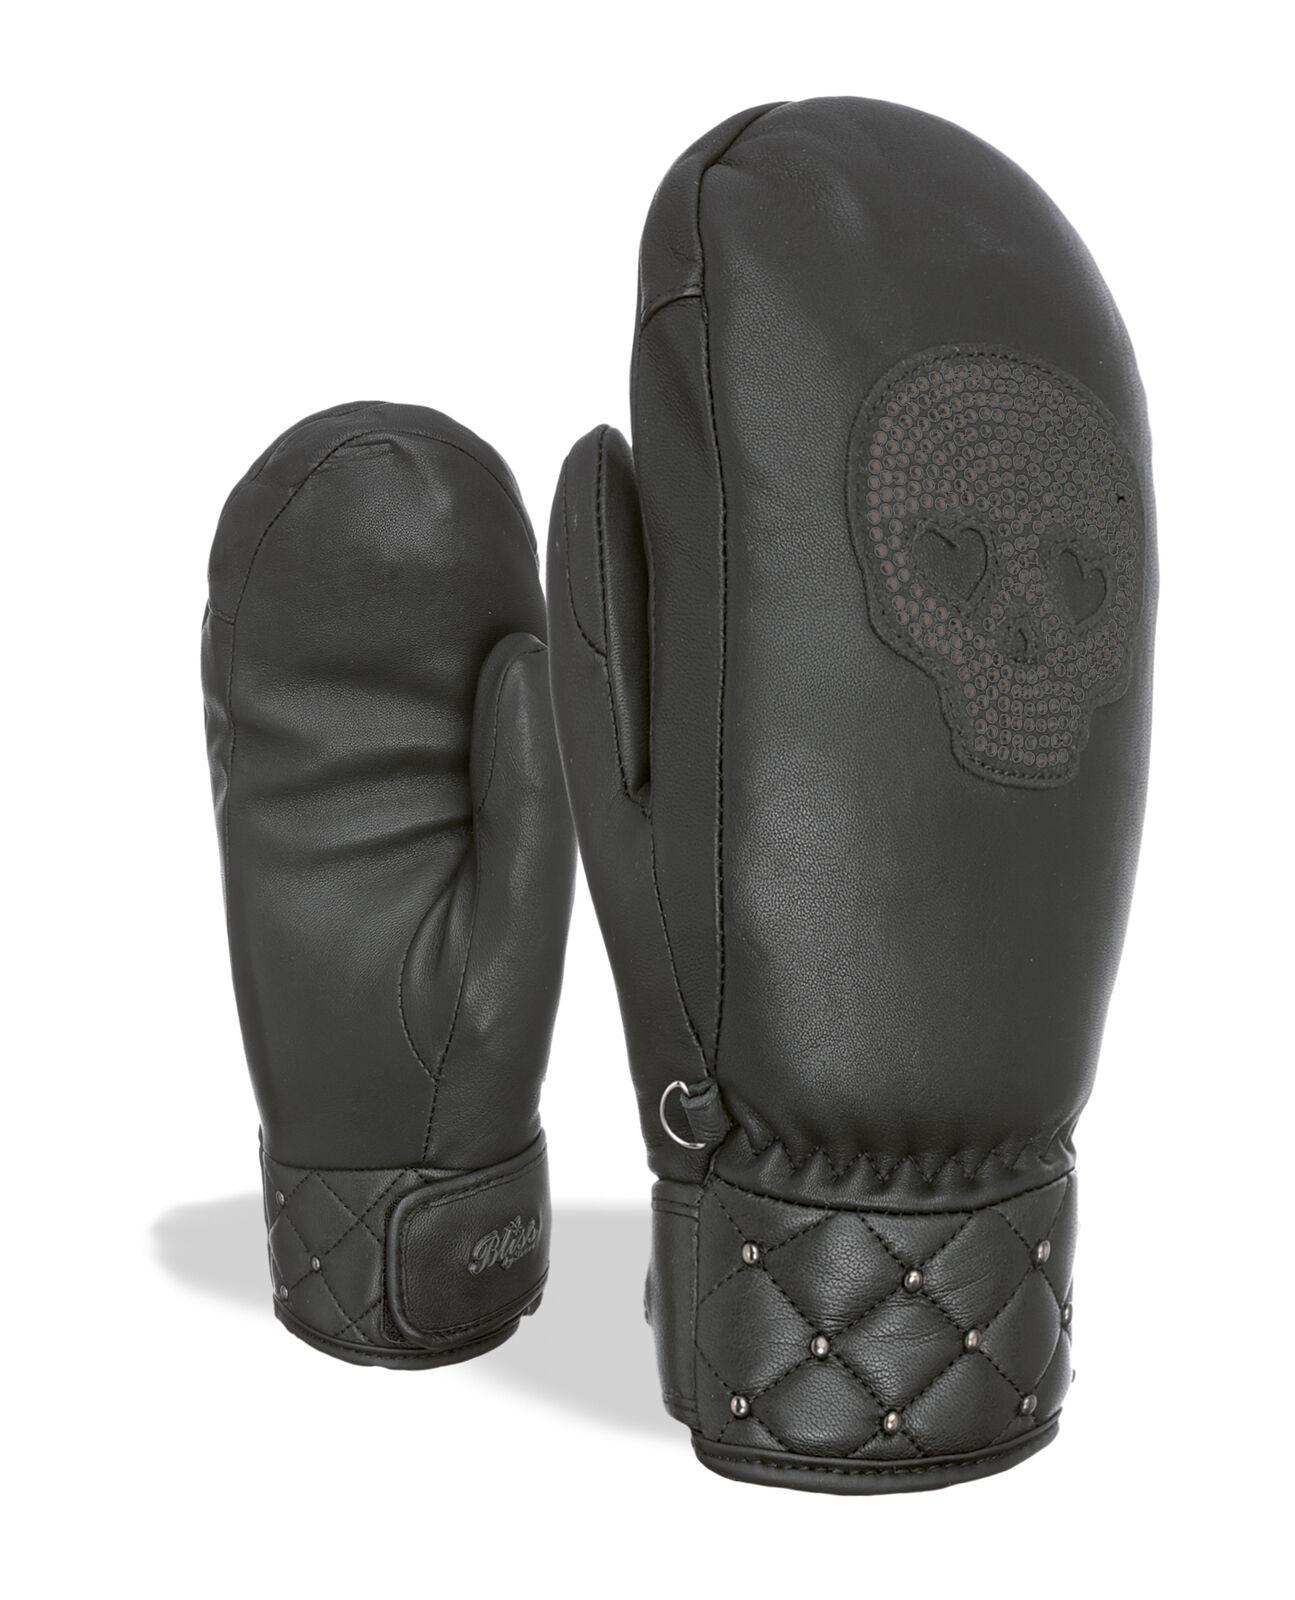 Level Guantes  Felicidad Coco Mitt black Impermeable Transpirable  wholesale